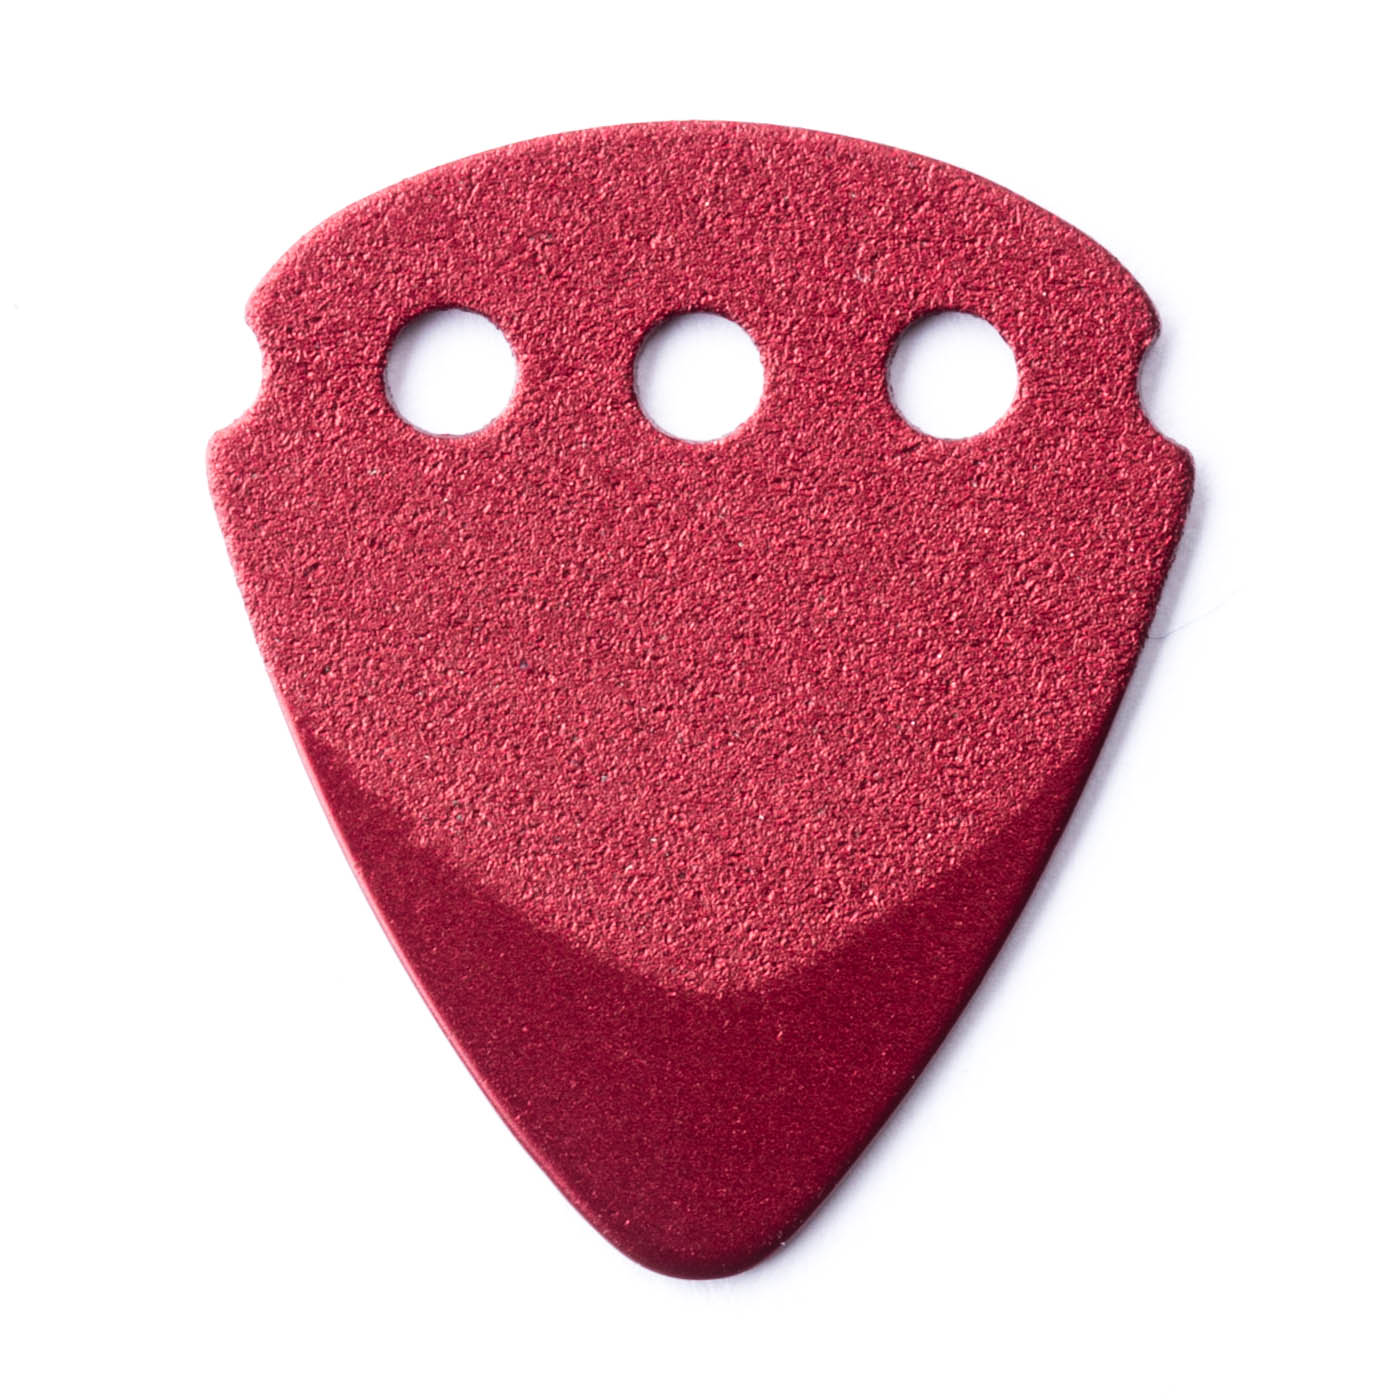 Teckpick - Aluminum red